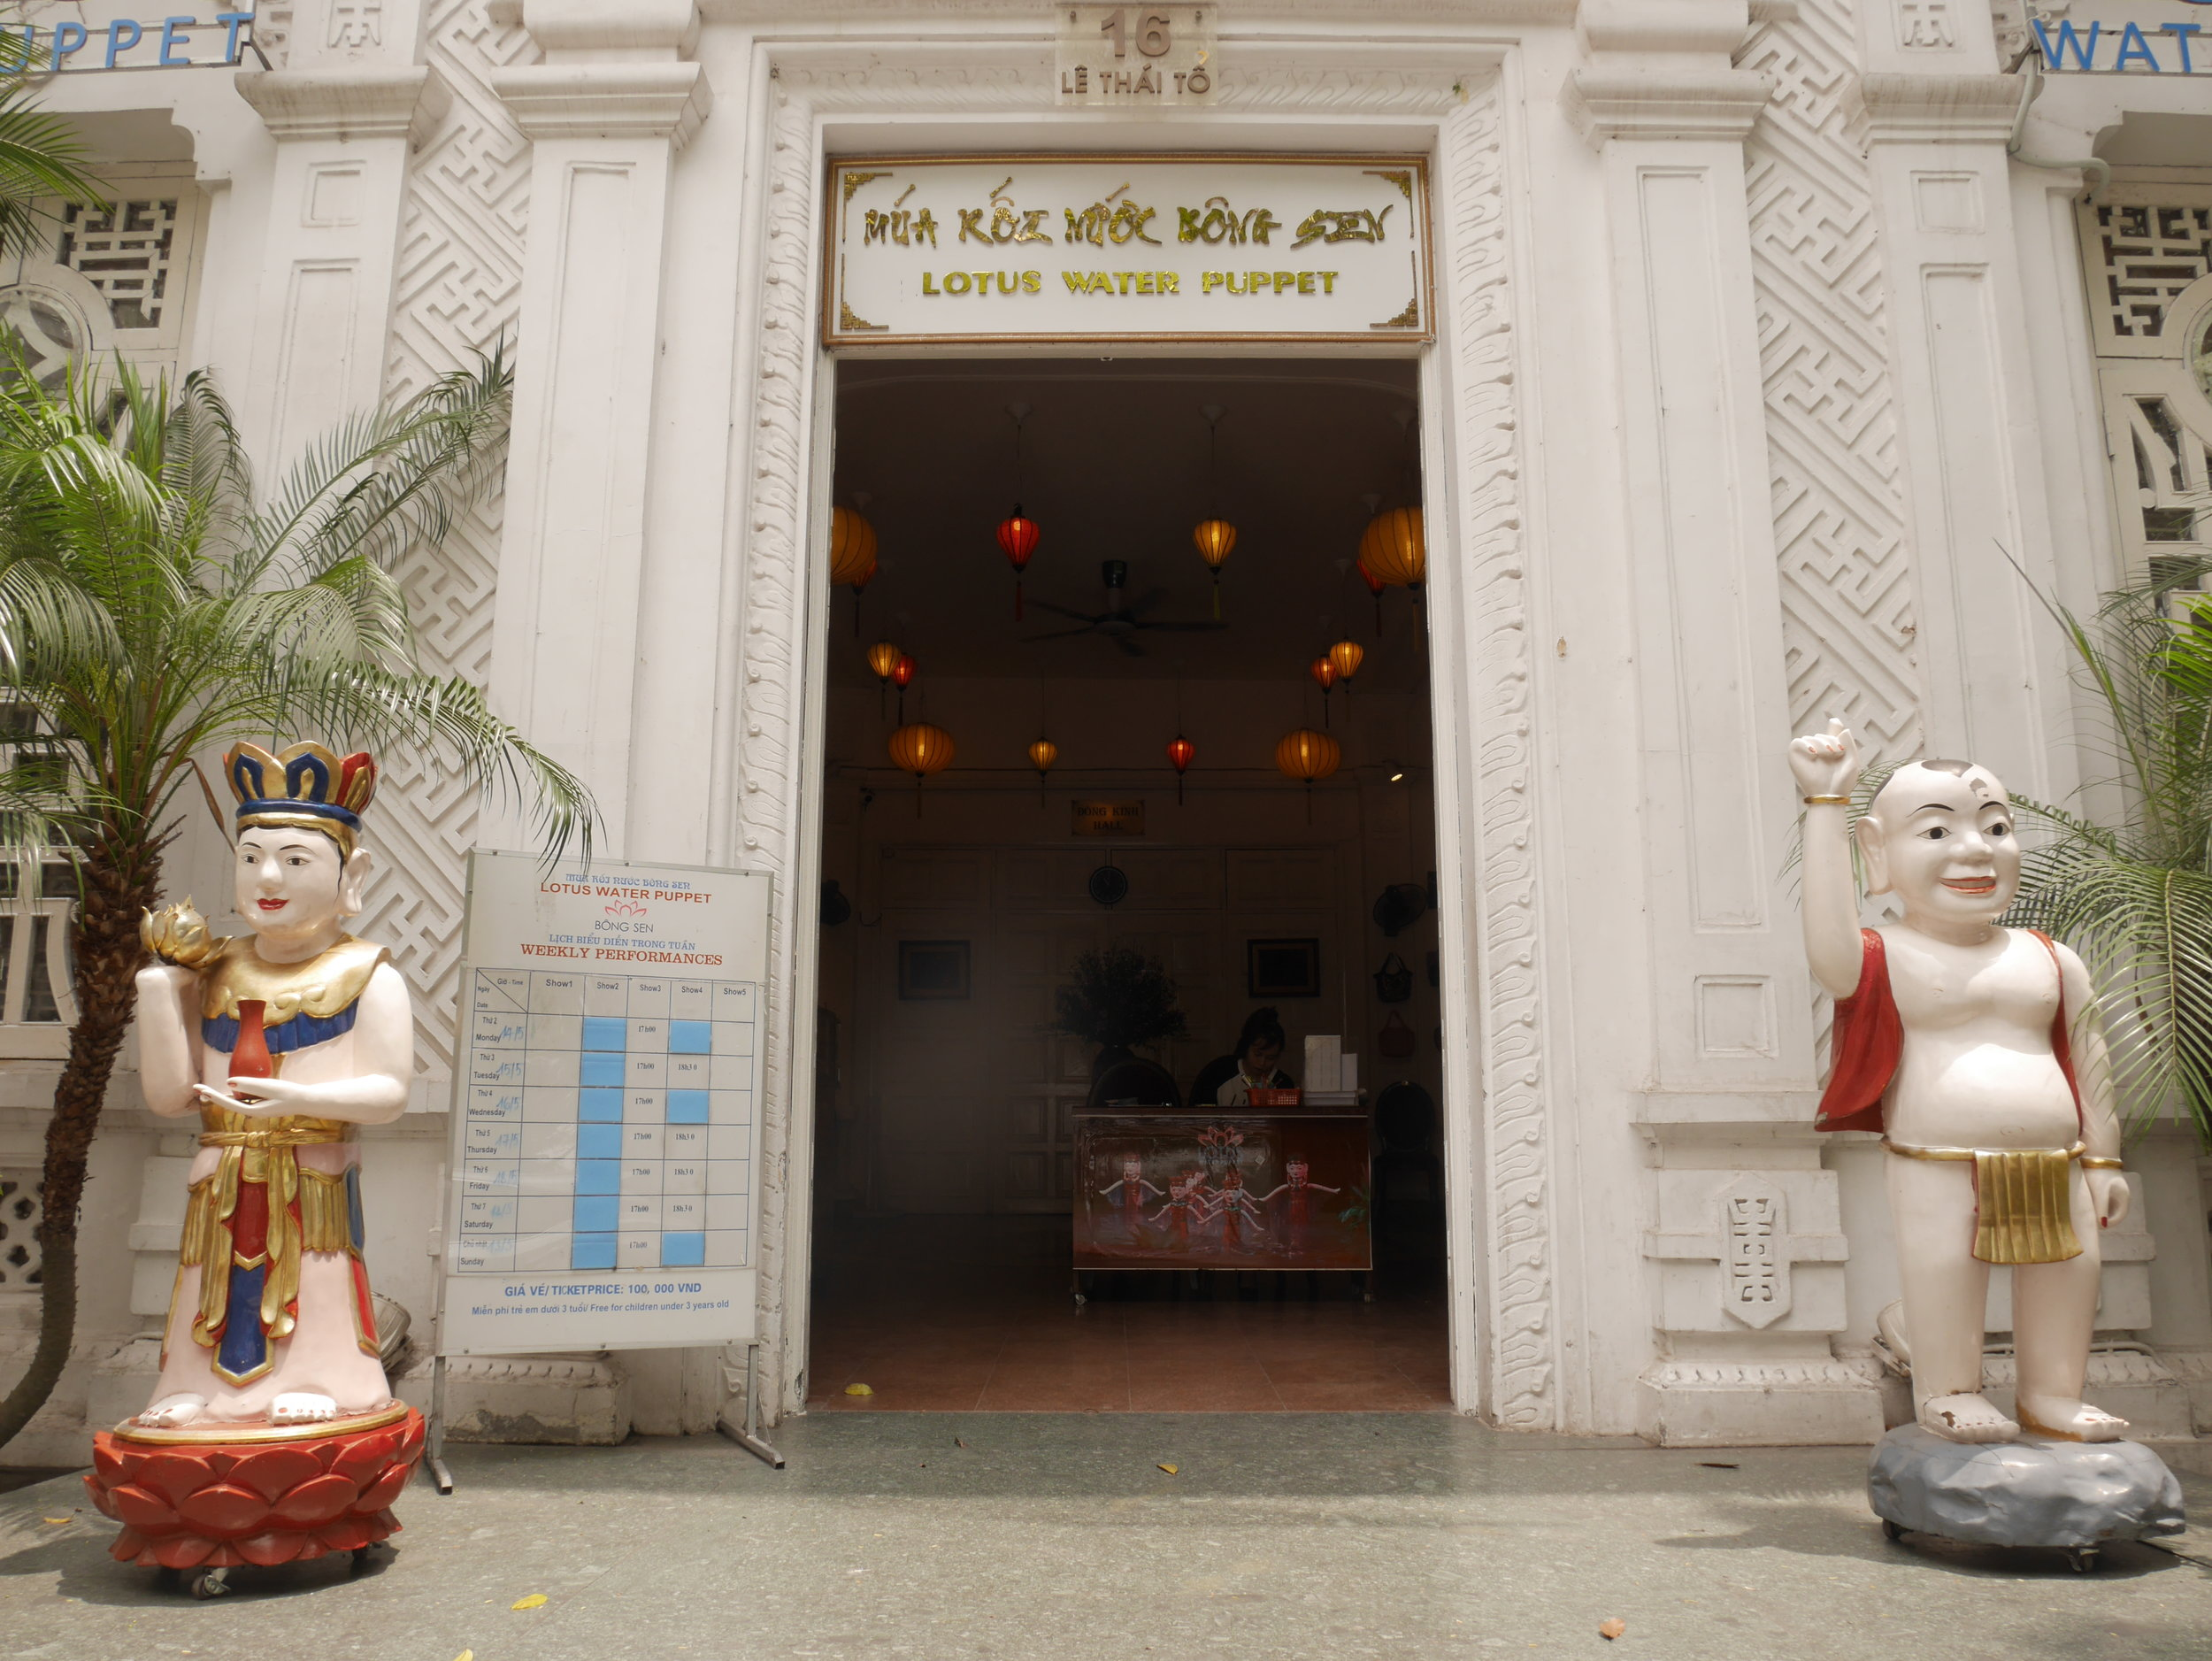 Lotus Water Puppet Theater